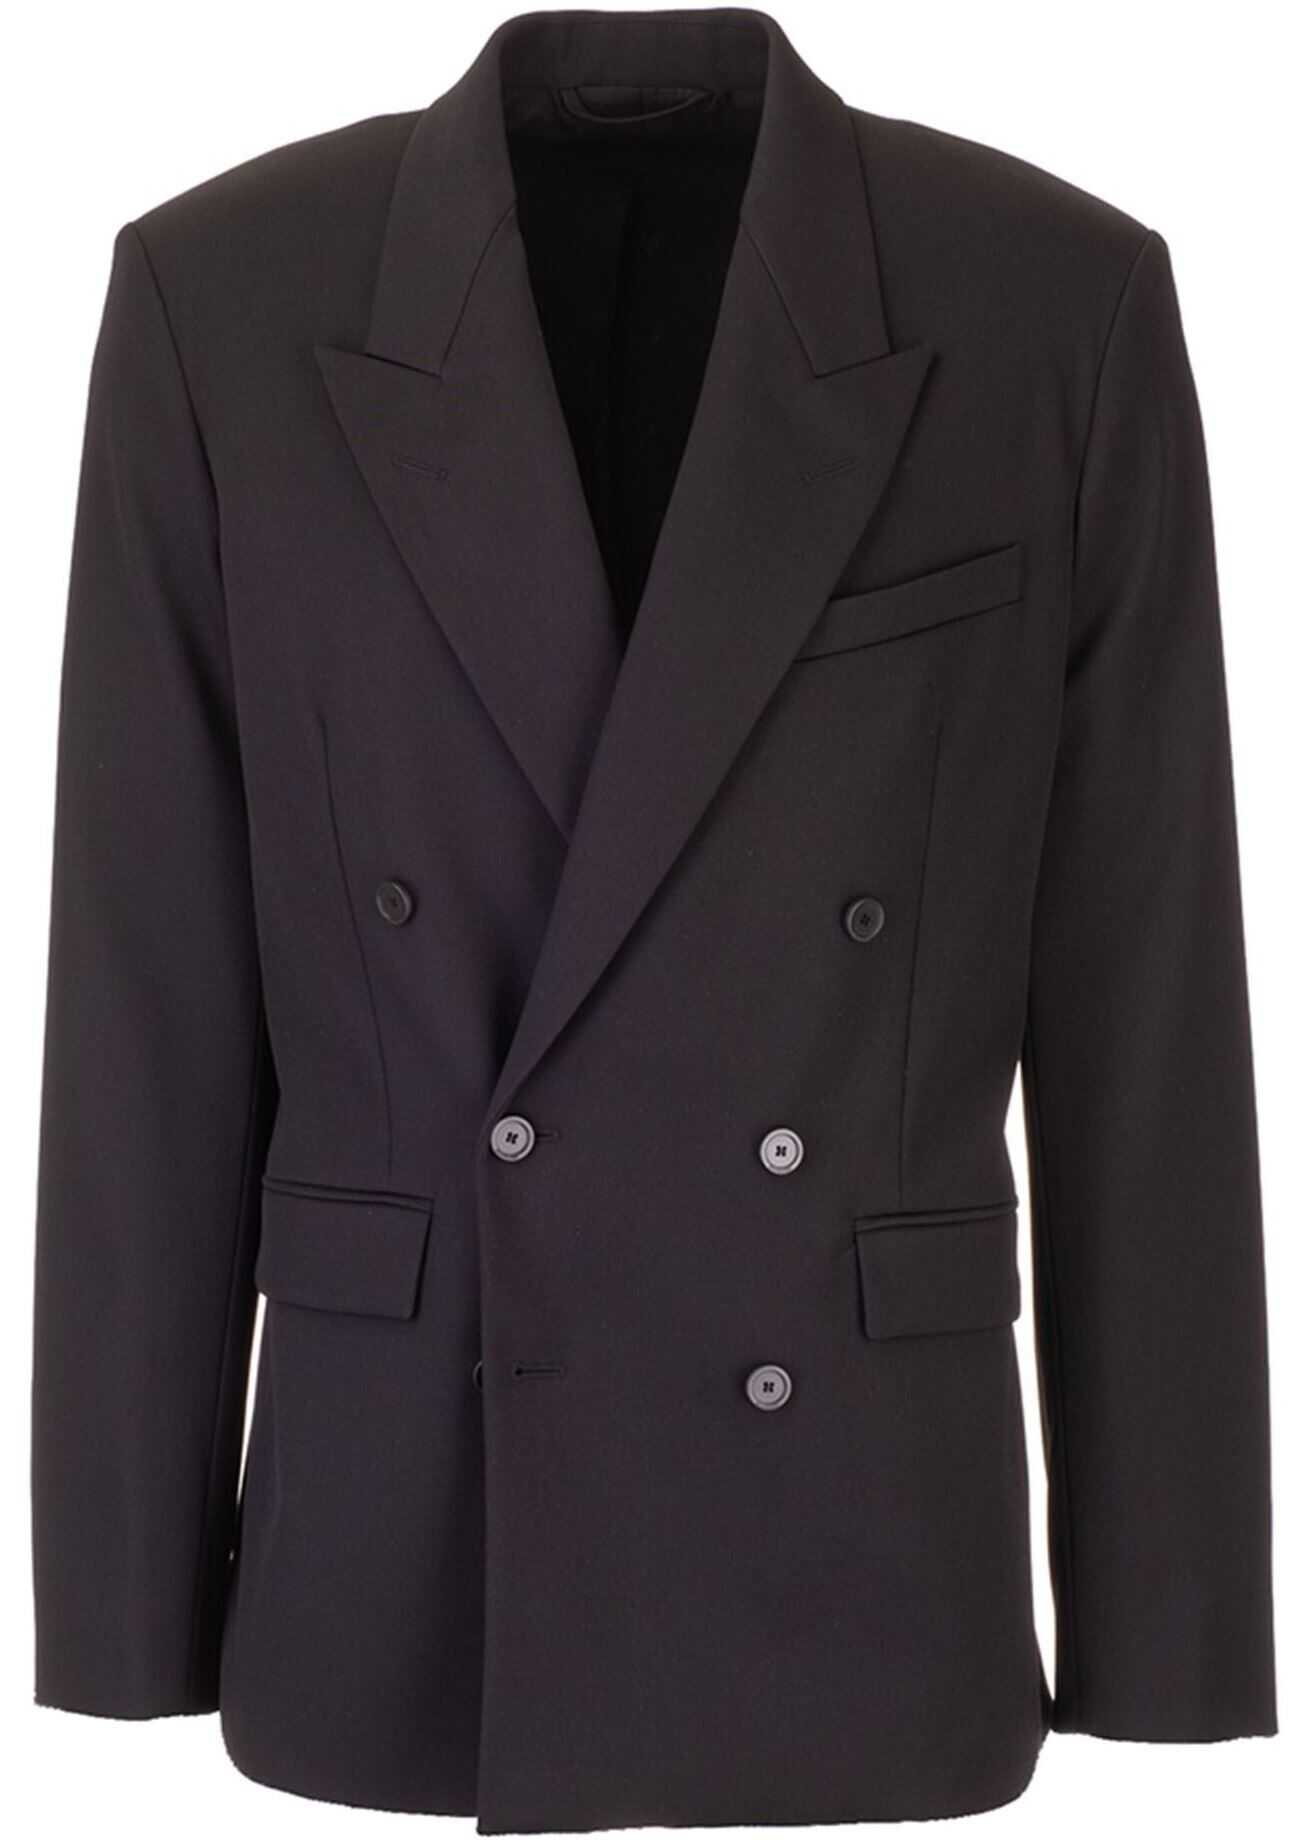 Balenciaga Double-Breasted Jacket In Black Black imagine